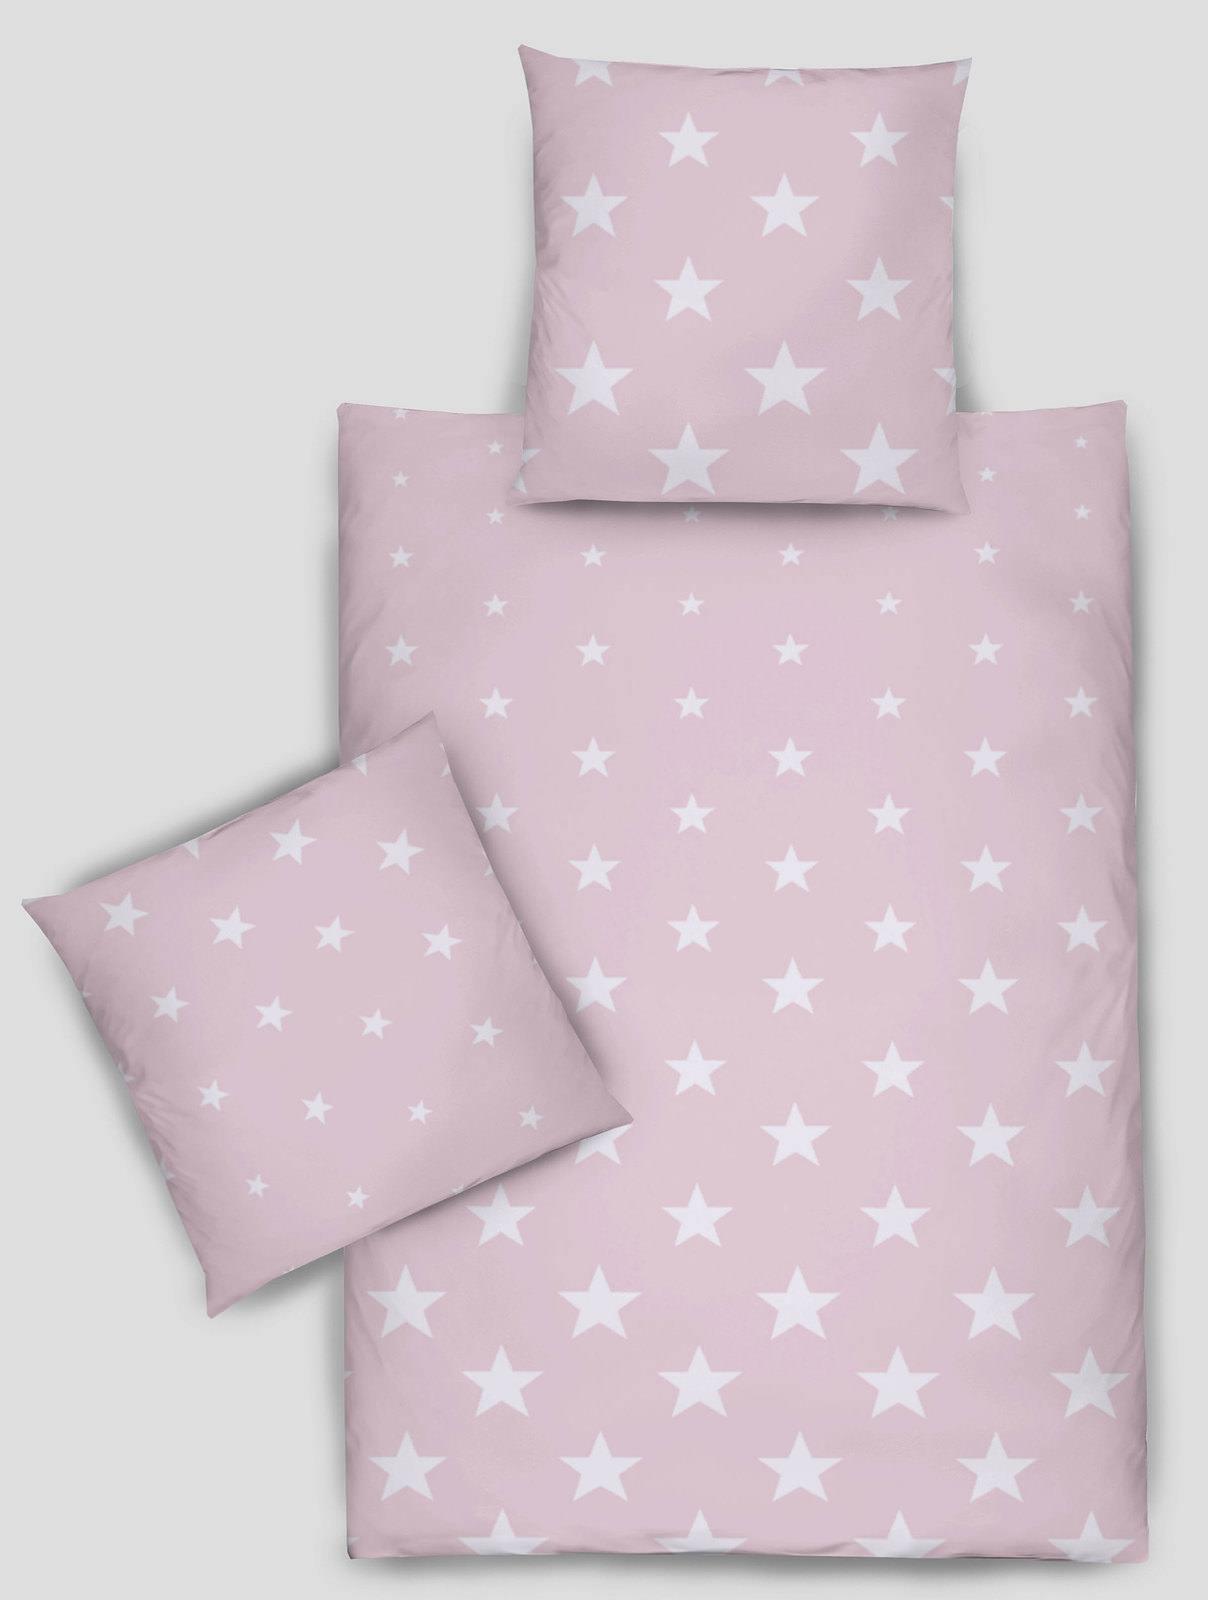 Dormisette Dormisette Biber Bettwäsche Pink Online Entdecken